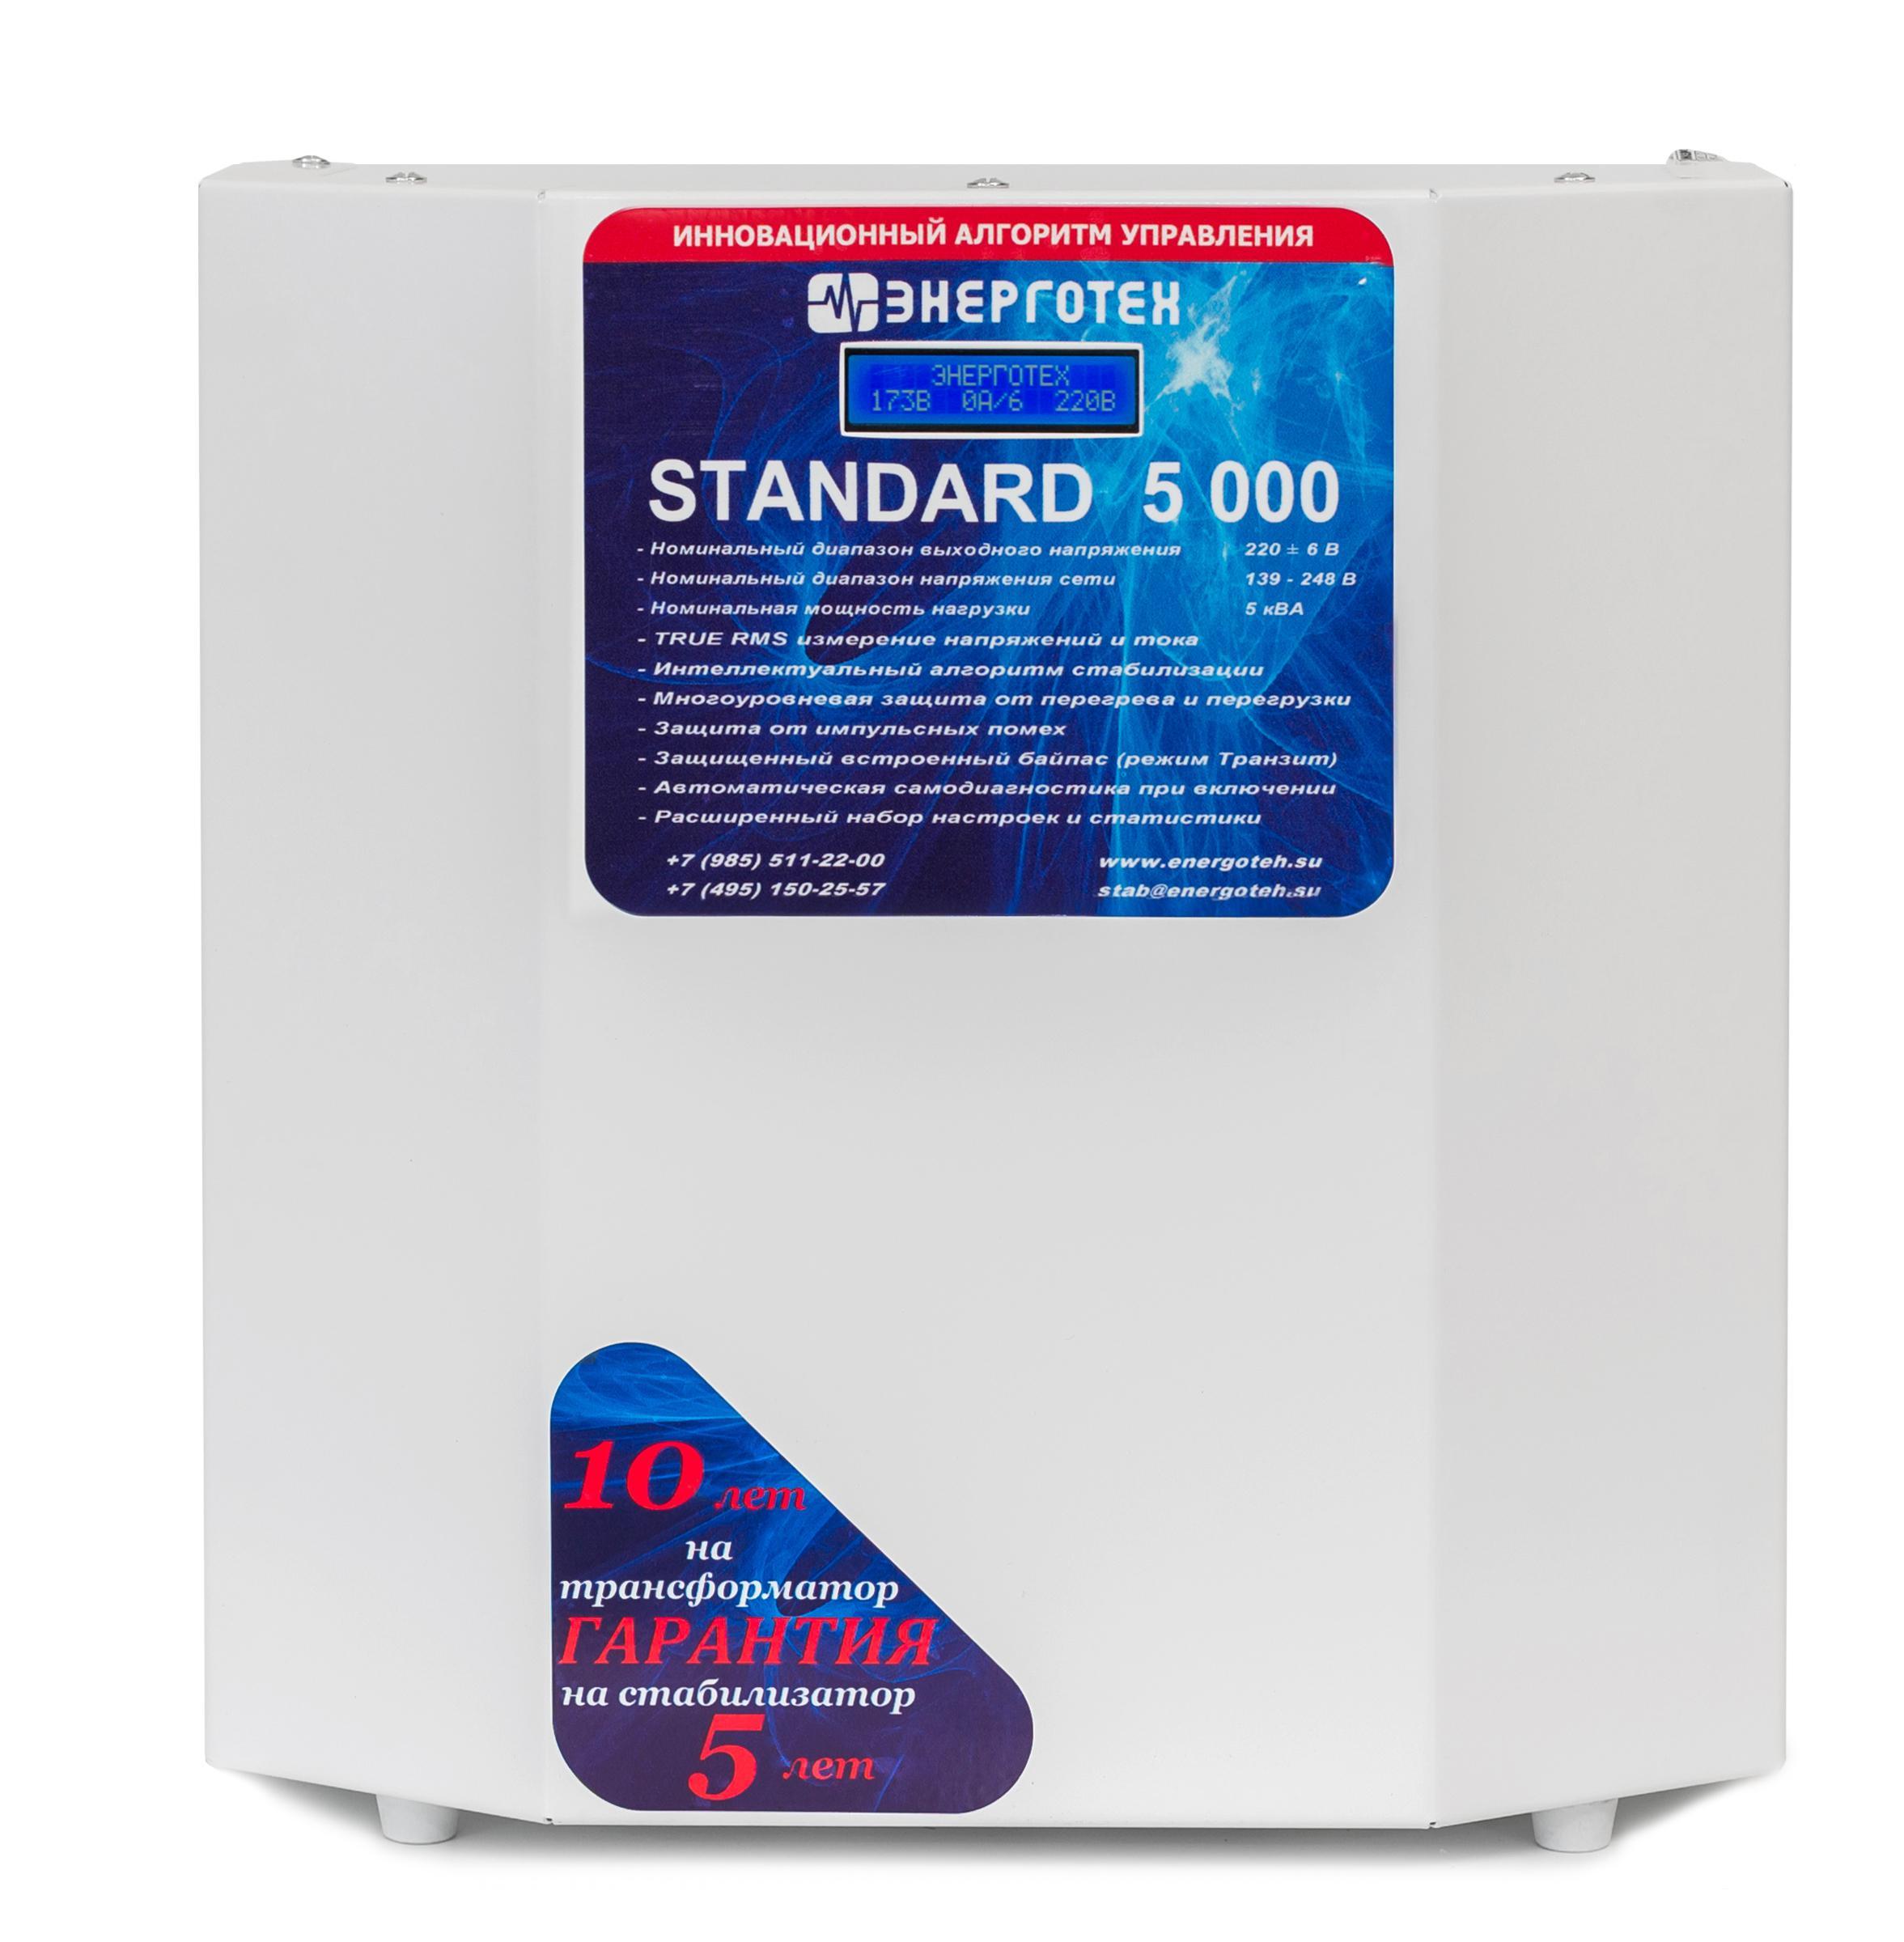 Стабилизатор напряжения ЭНЕРГОТЕХ Standard 5000 (lv) standard regular 2 tag gun fasteners 5000